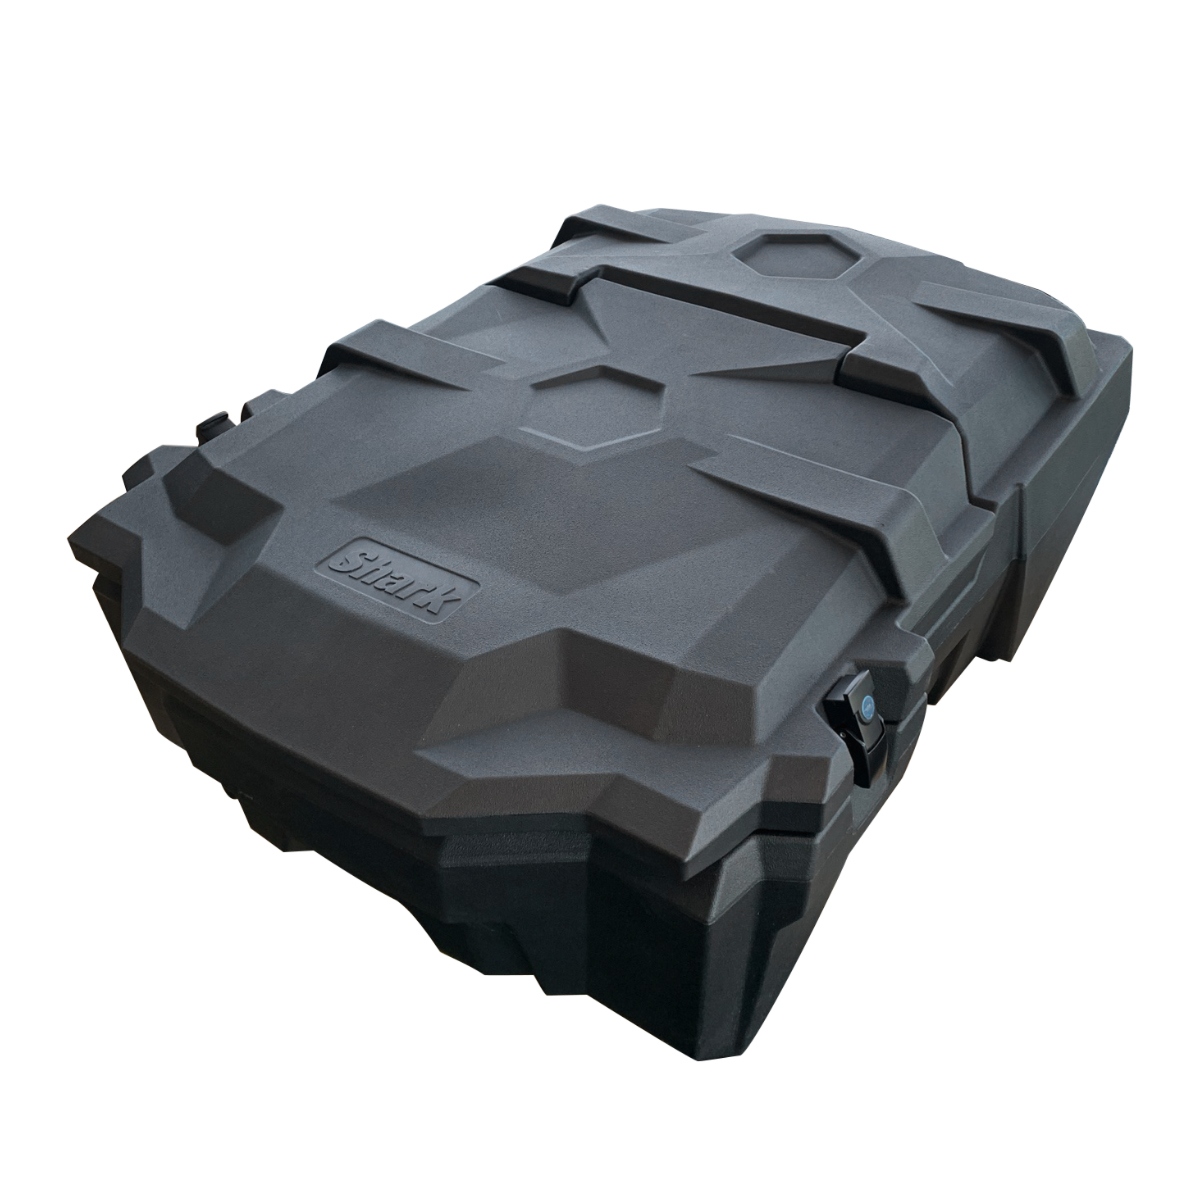 SHARK UTV cargo Box UX140